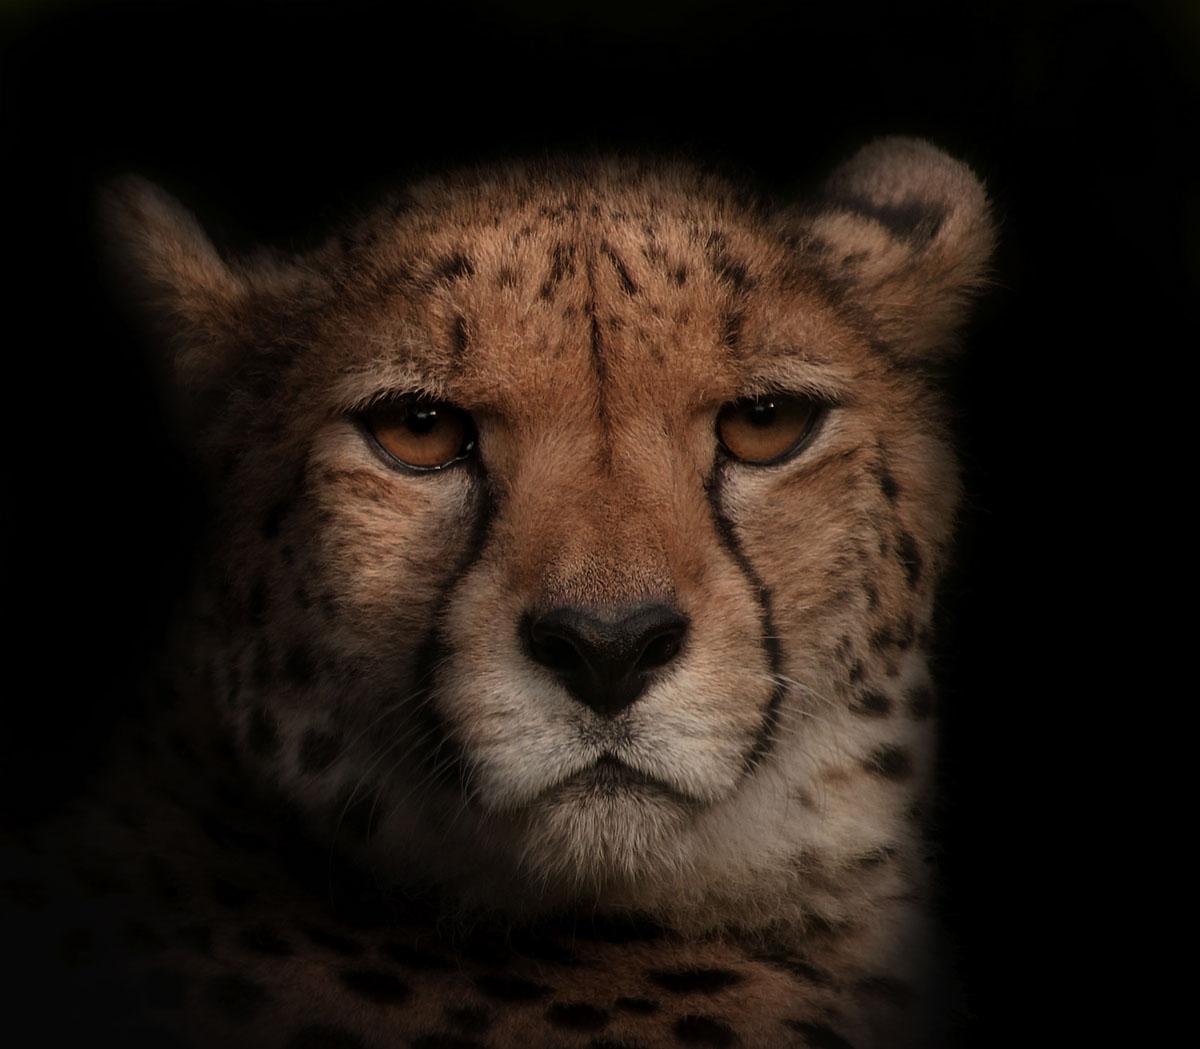 Портреты животных / фото Paul Sawford